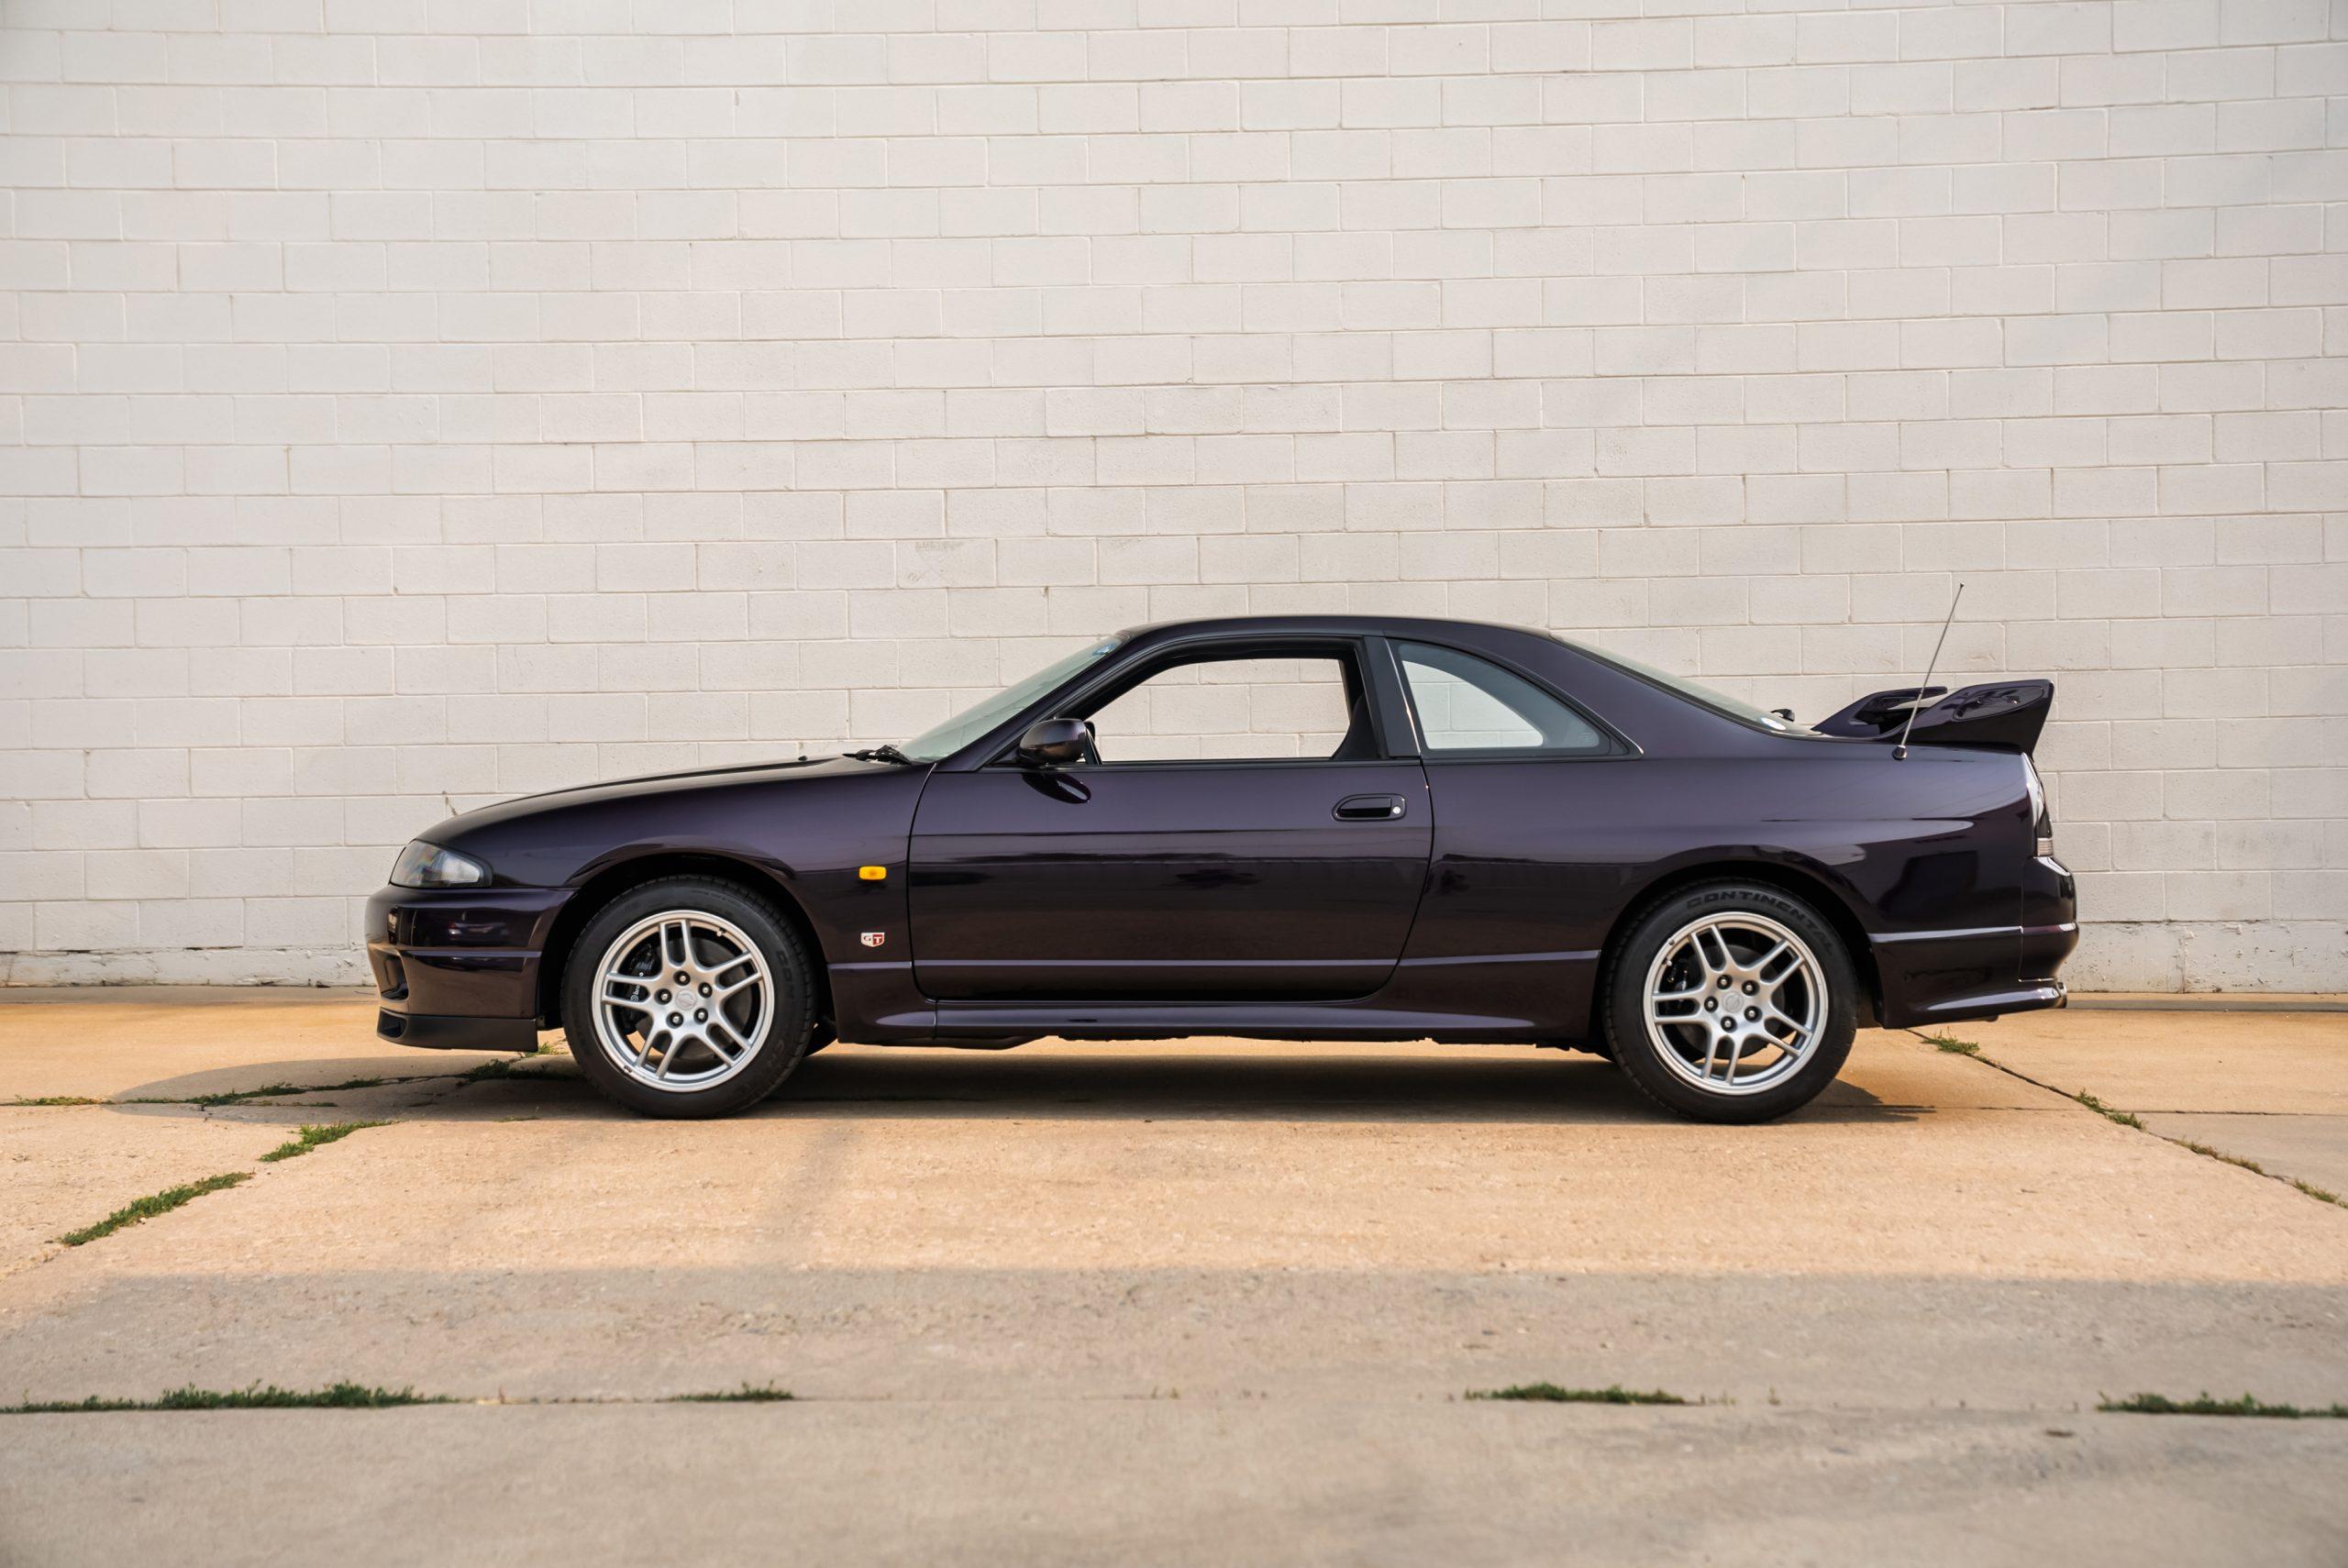 1995-Nissan-Skyline-GT-R side profile